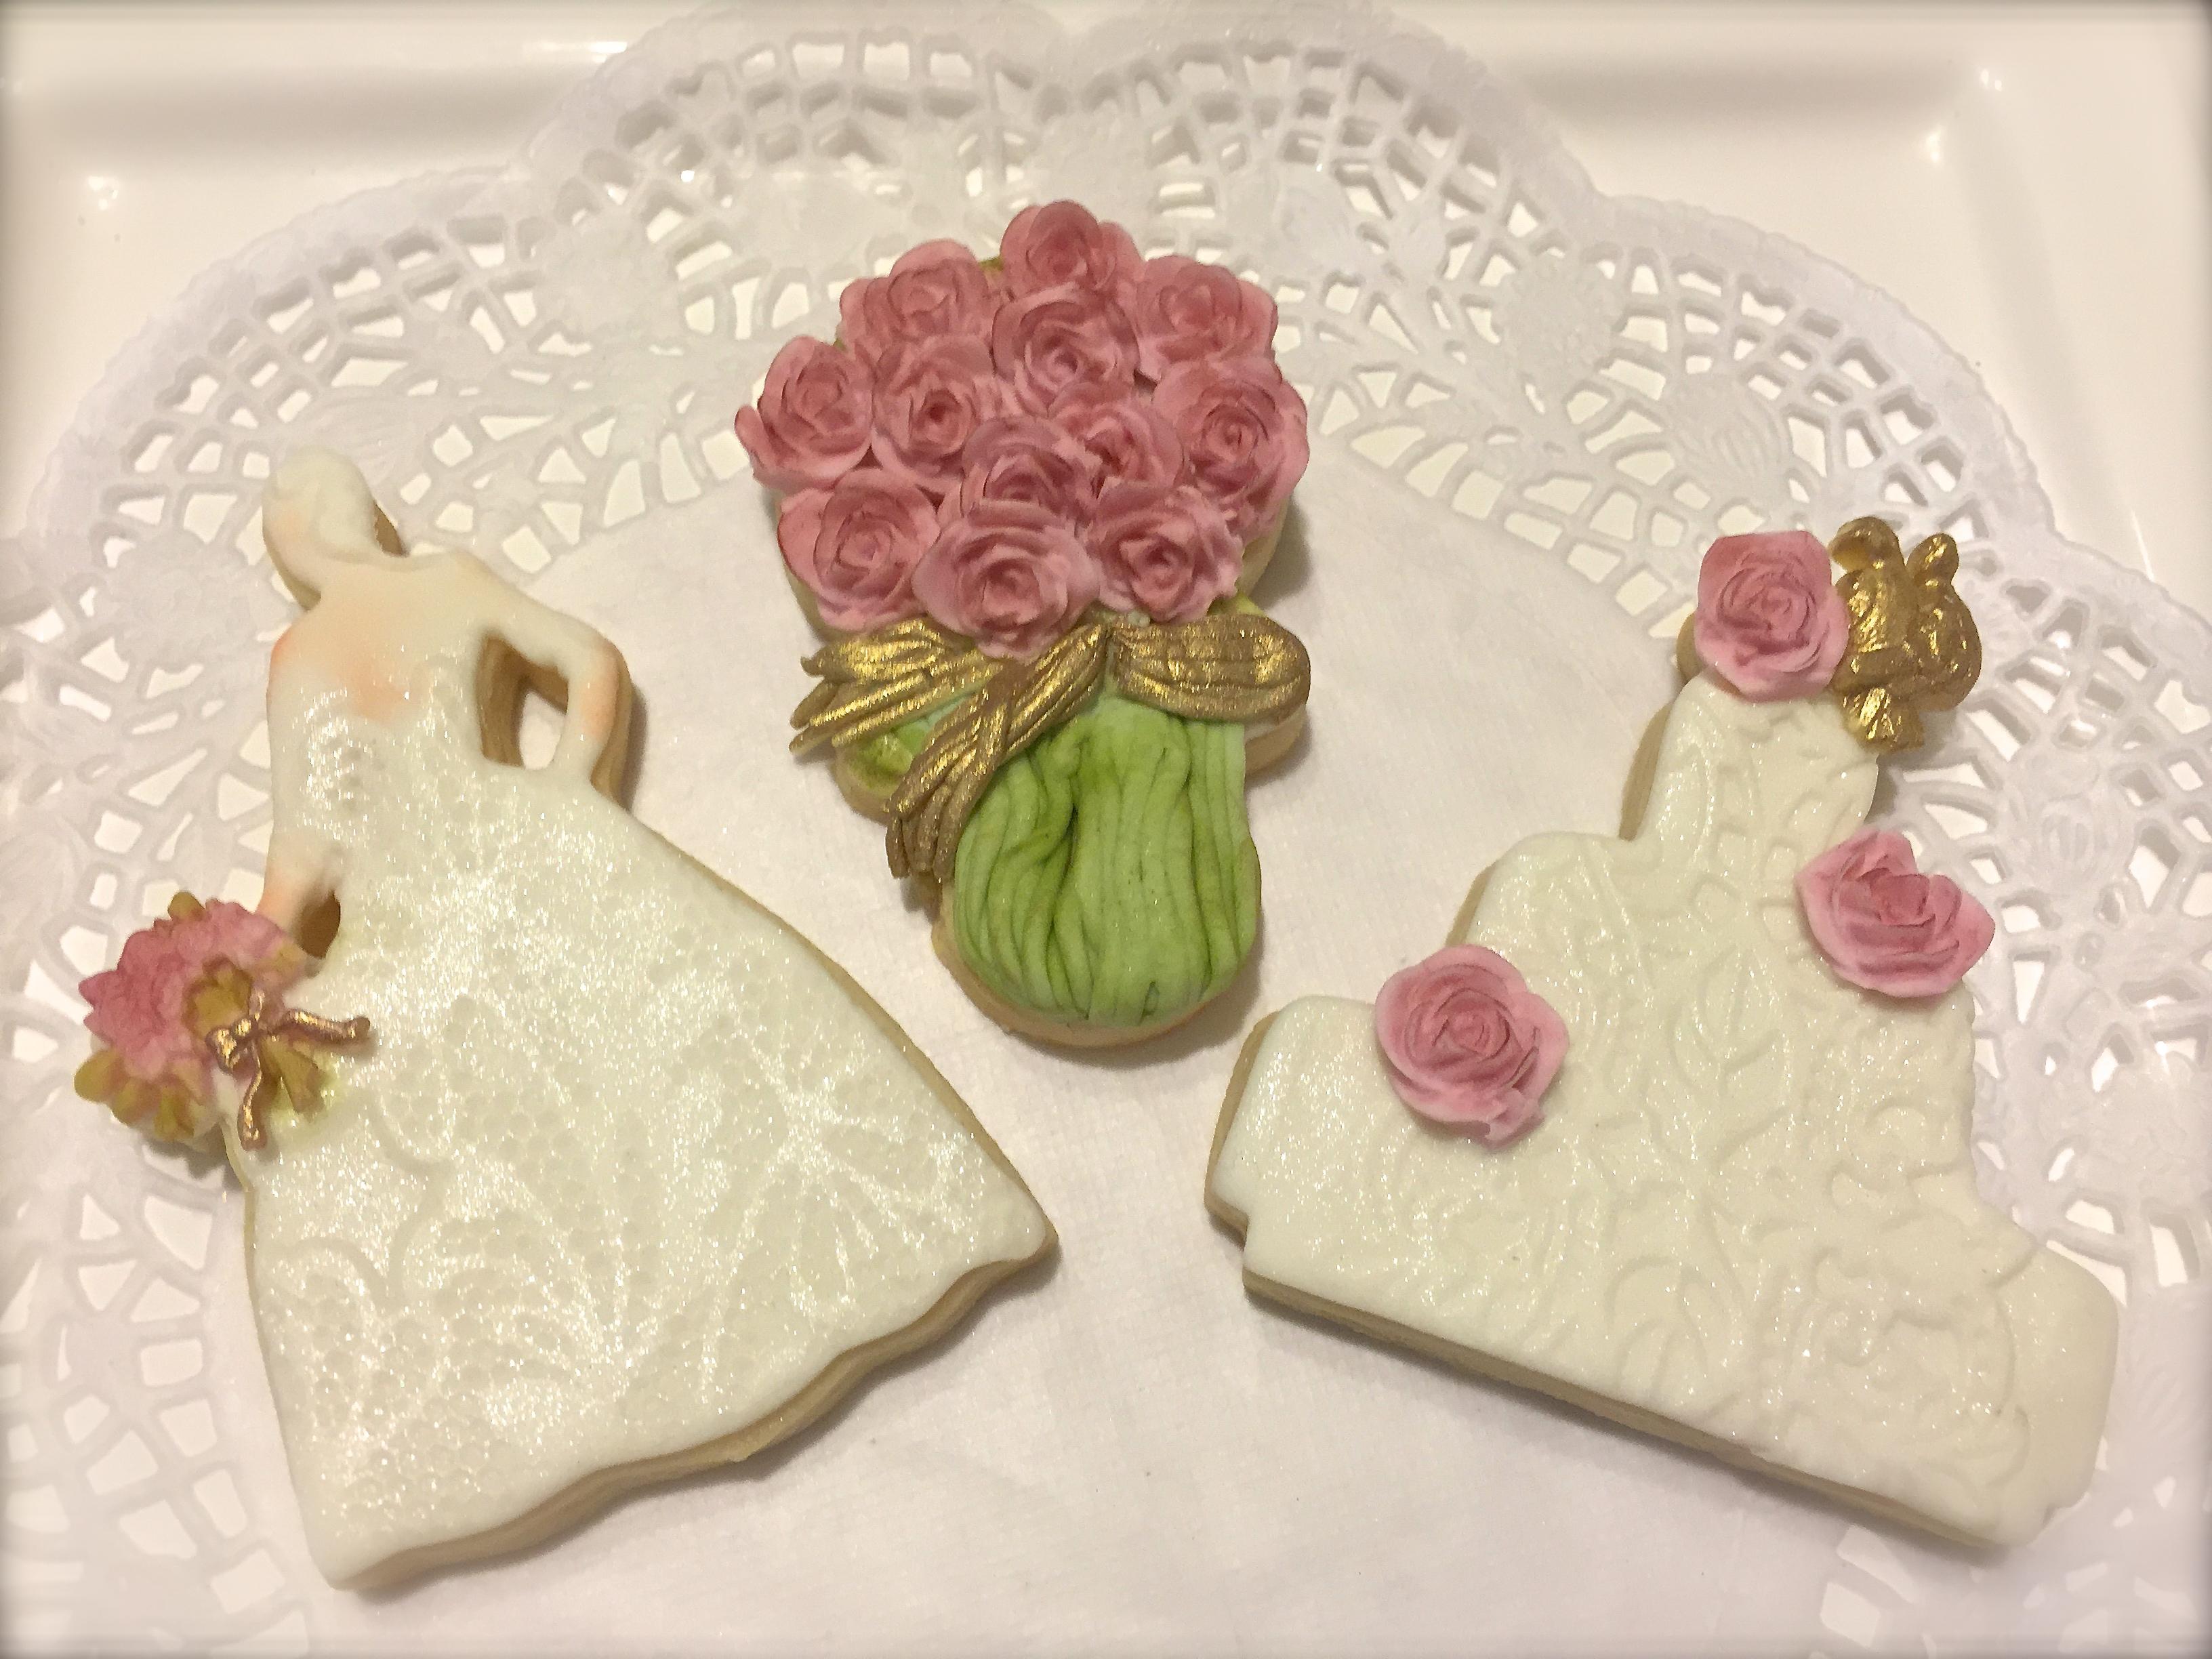 Bride, wedding bouquet & cake set